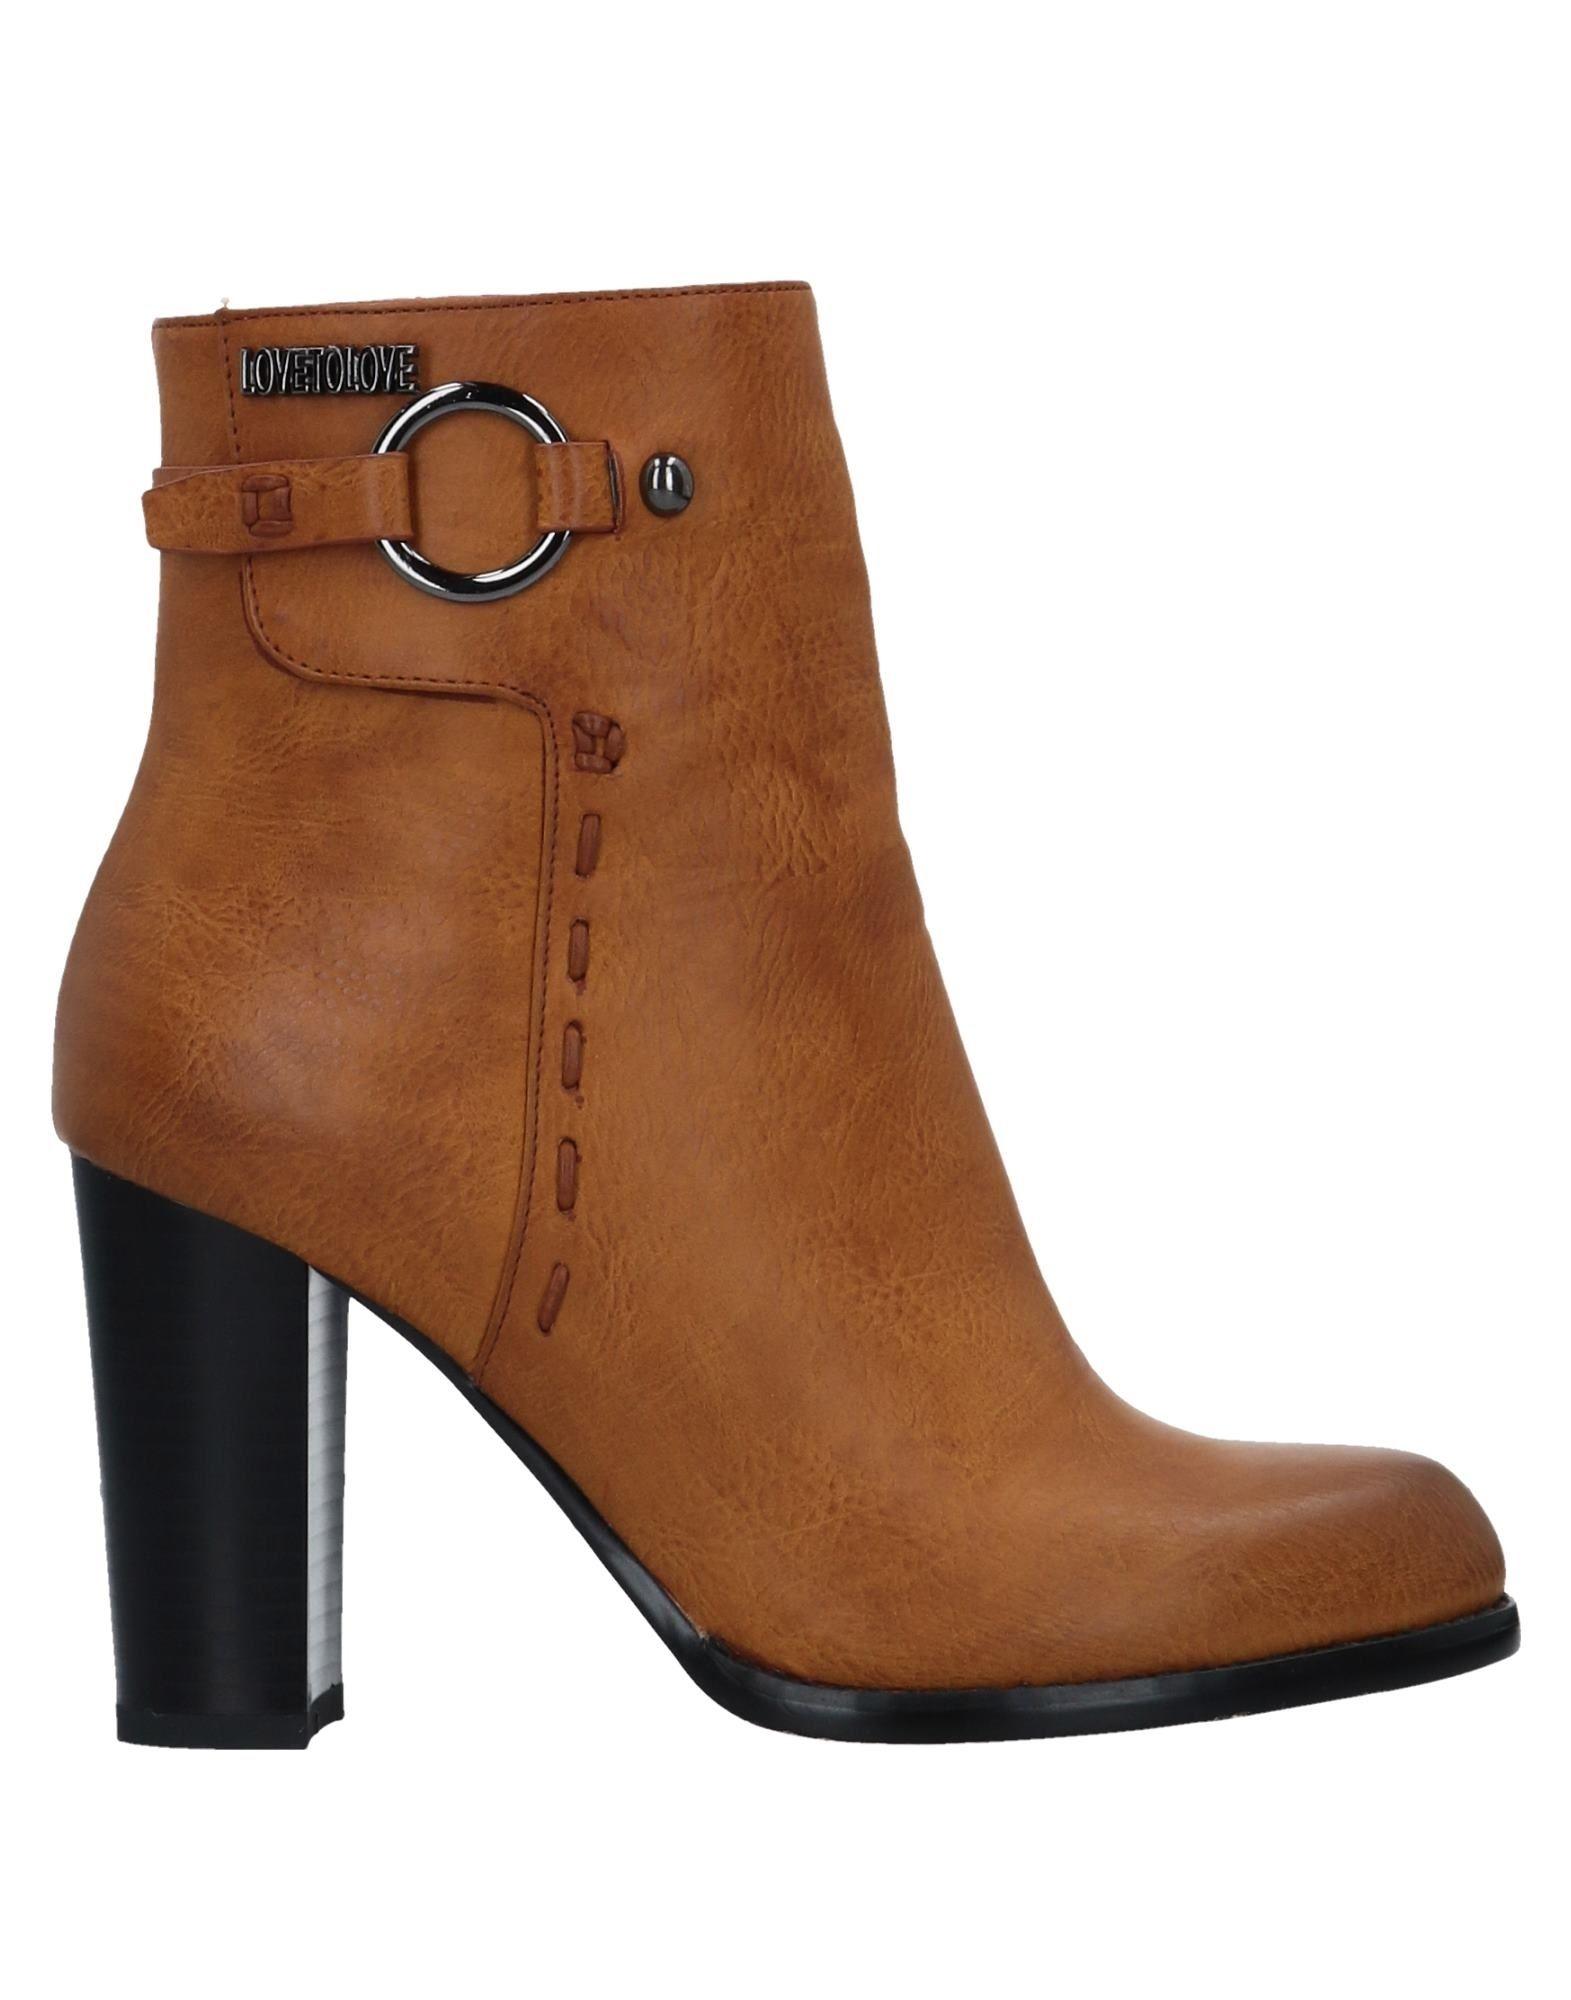 Gai Mattiolo Stiefelette Damen  11535216AO Gute Qualität beliebte Schuhe